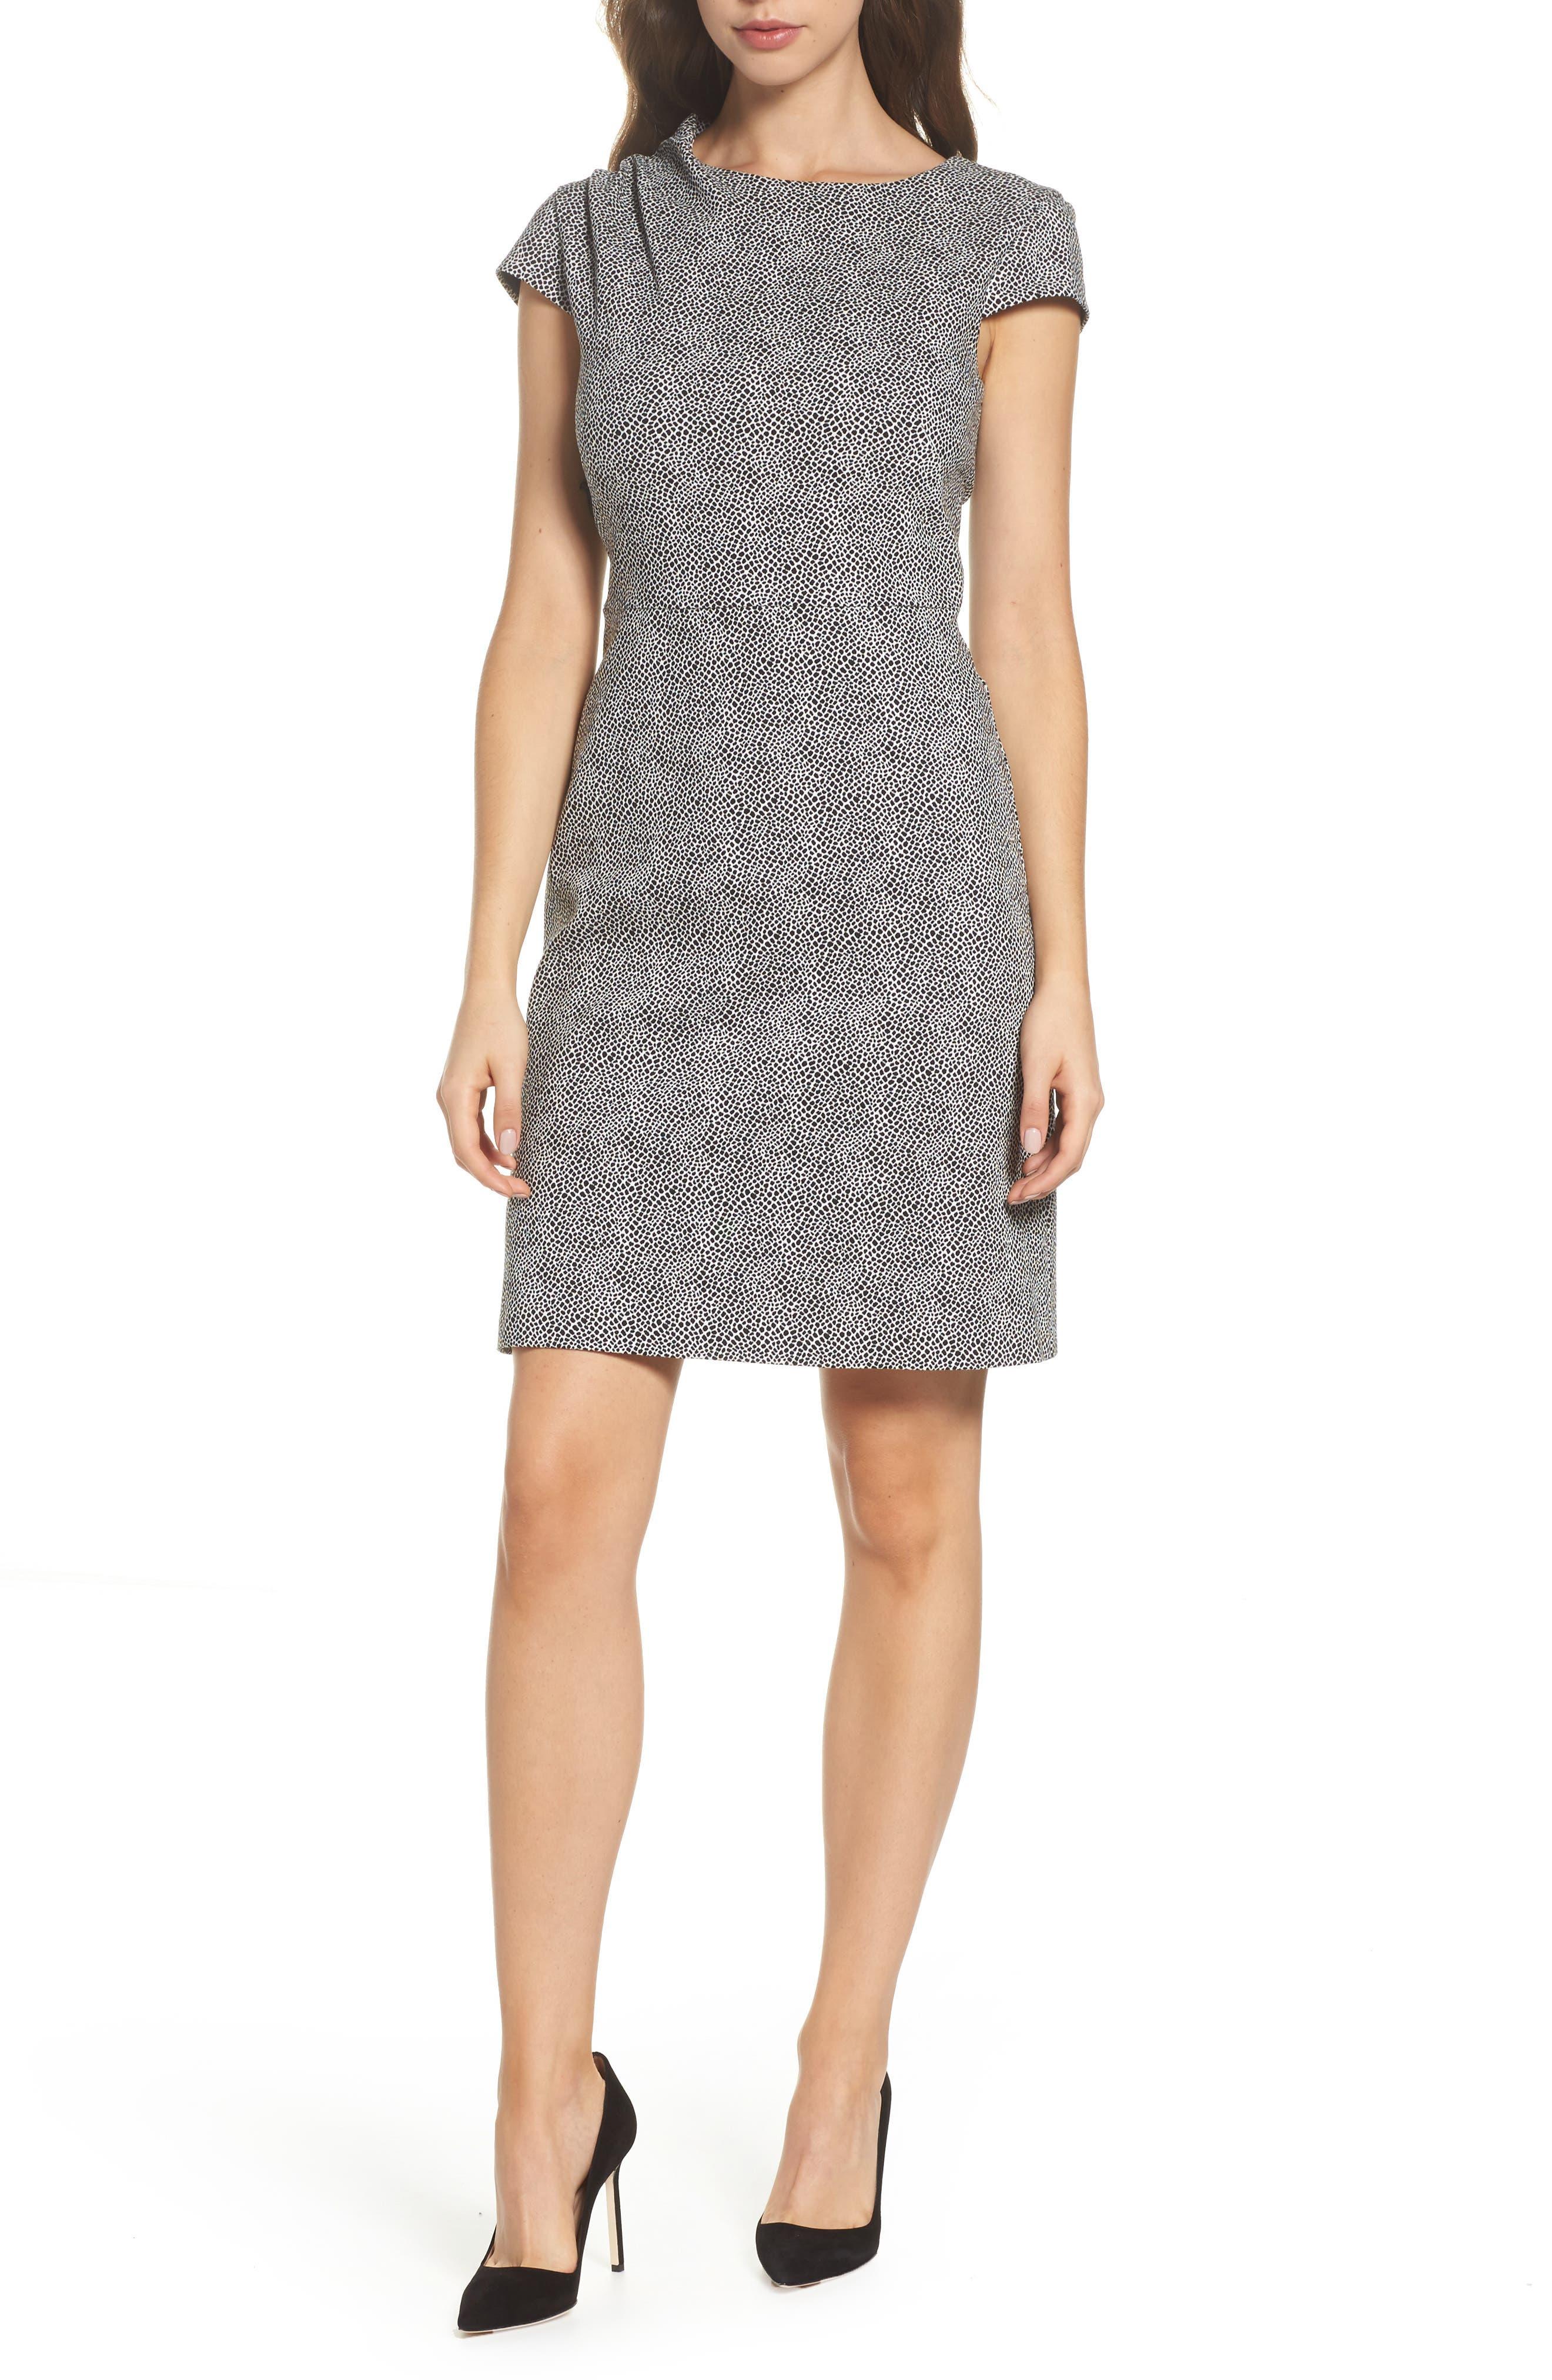 Jacquard Sheath Dress,                         Main,                         color, 001